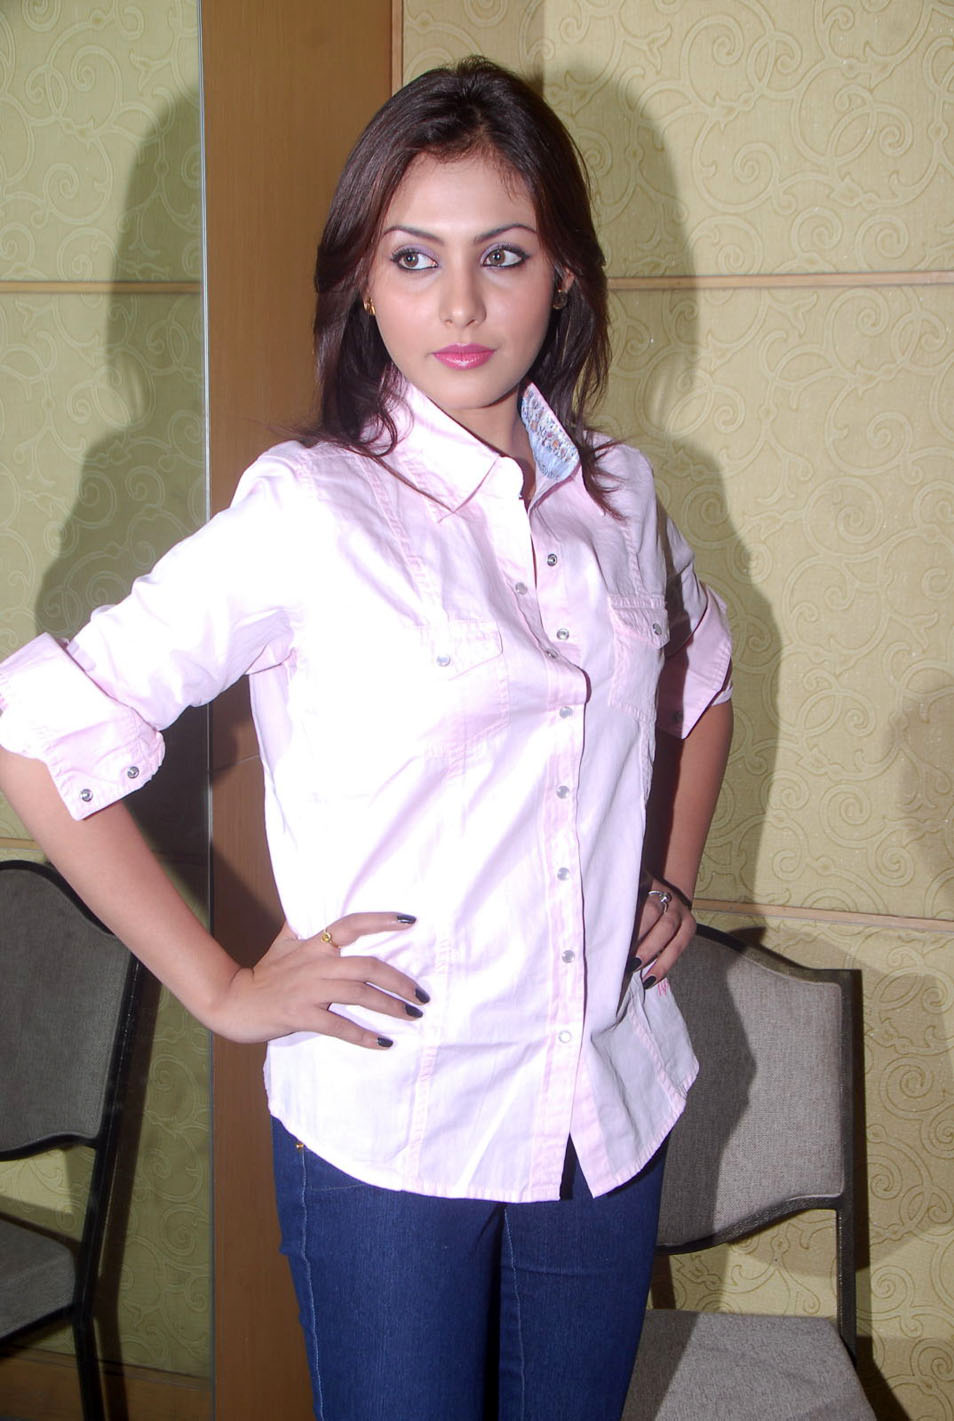 Madhu Shalini Hot Sex Pretty madhu shalini in jeans and men's shirtsola con mi desesperaciÓn